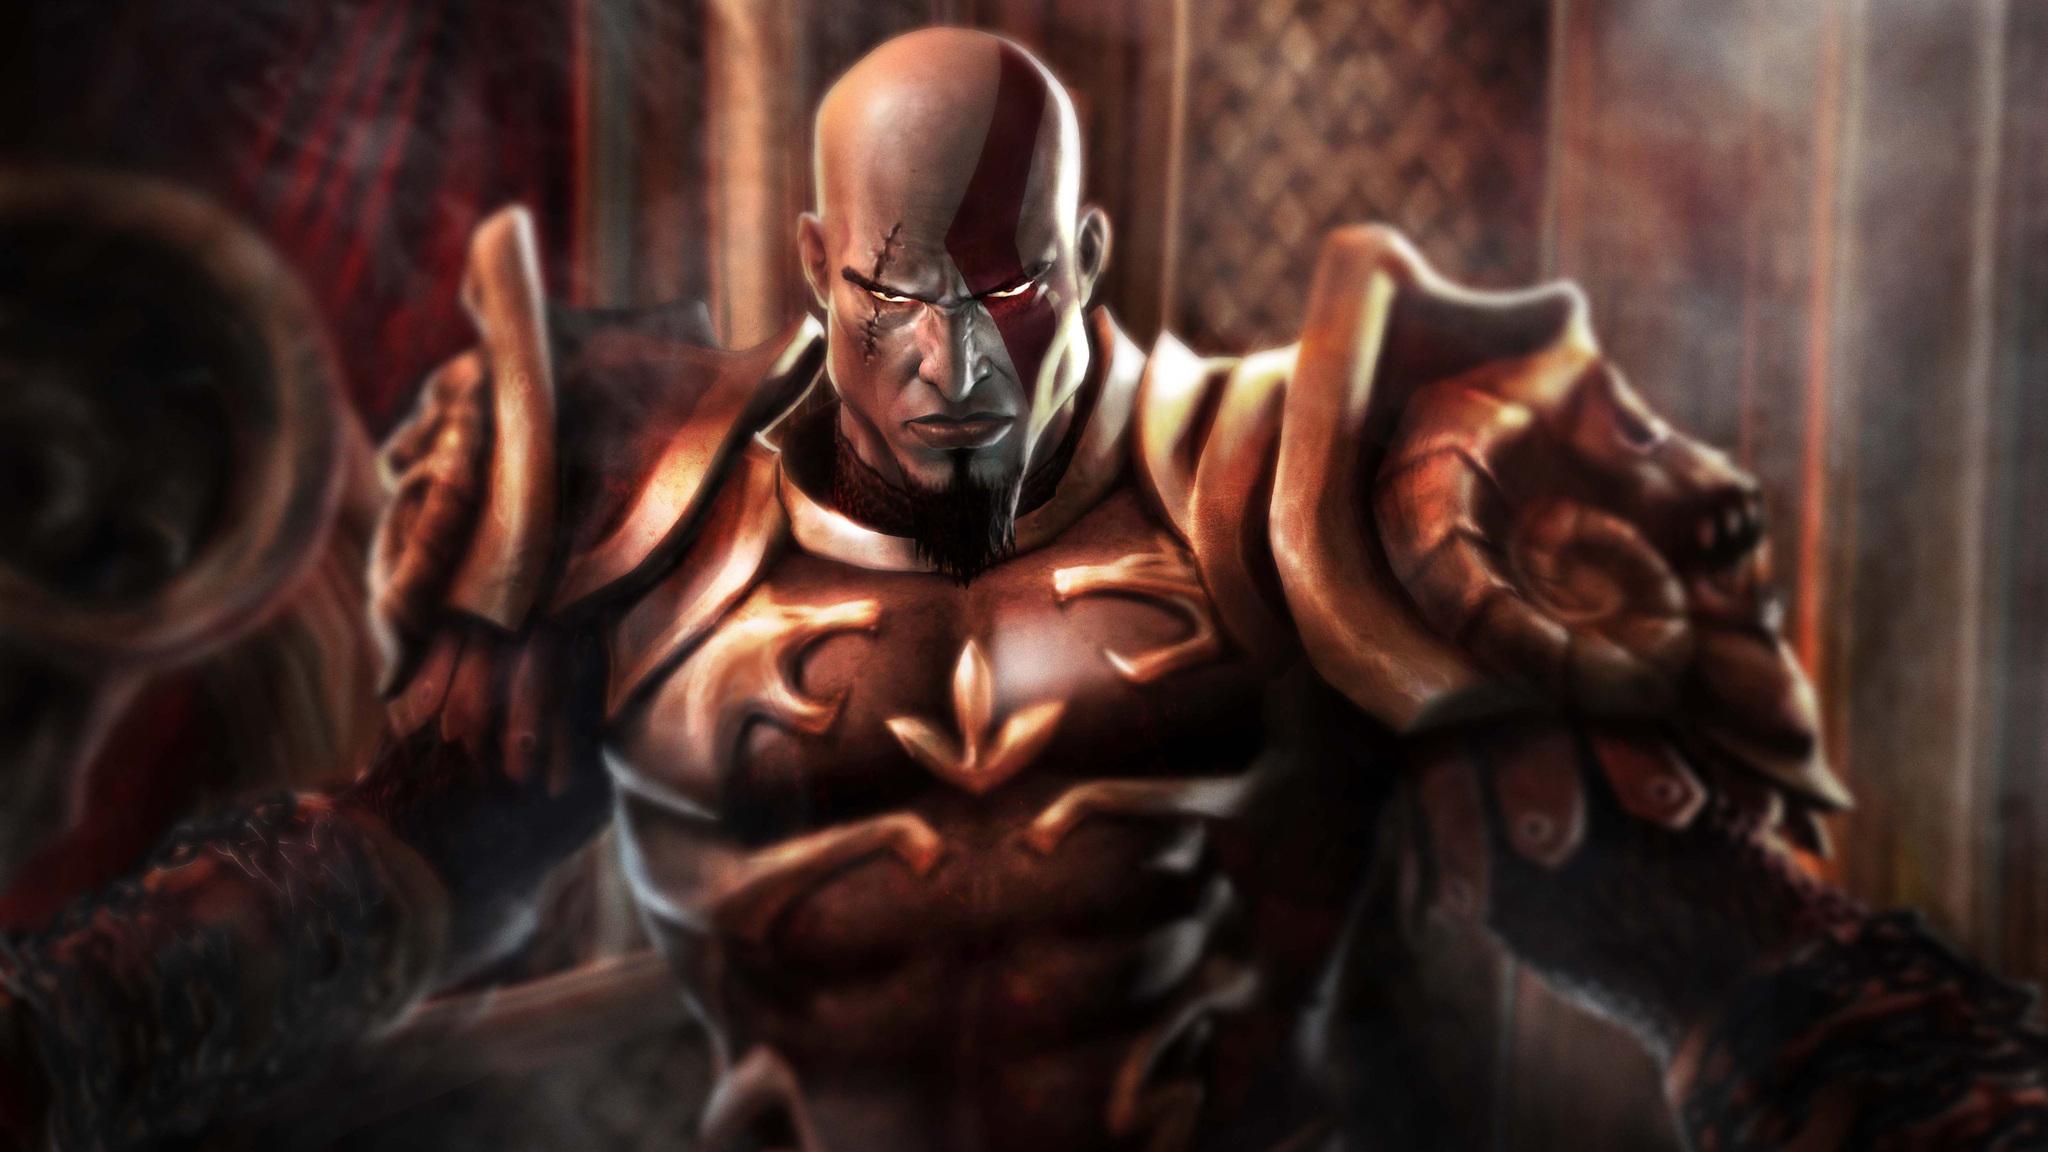 kratos-in-god-of-war-5k-uj.jpg